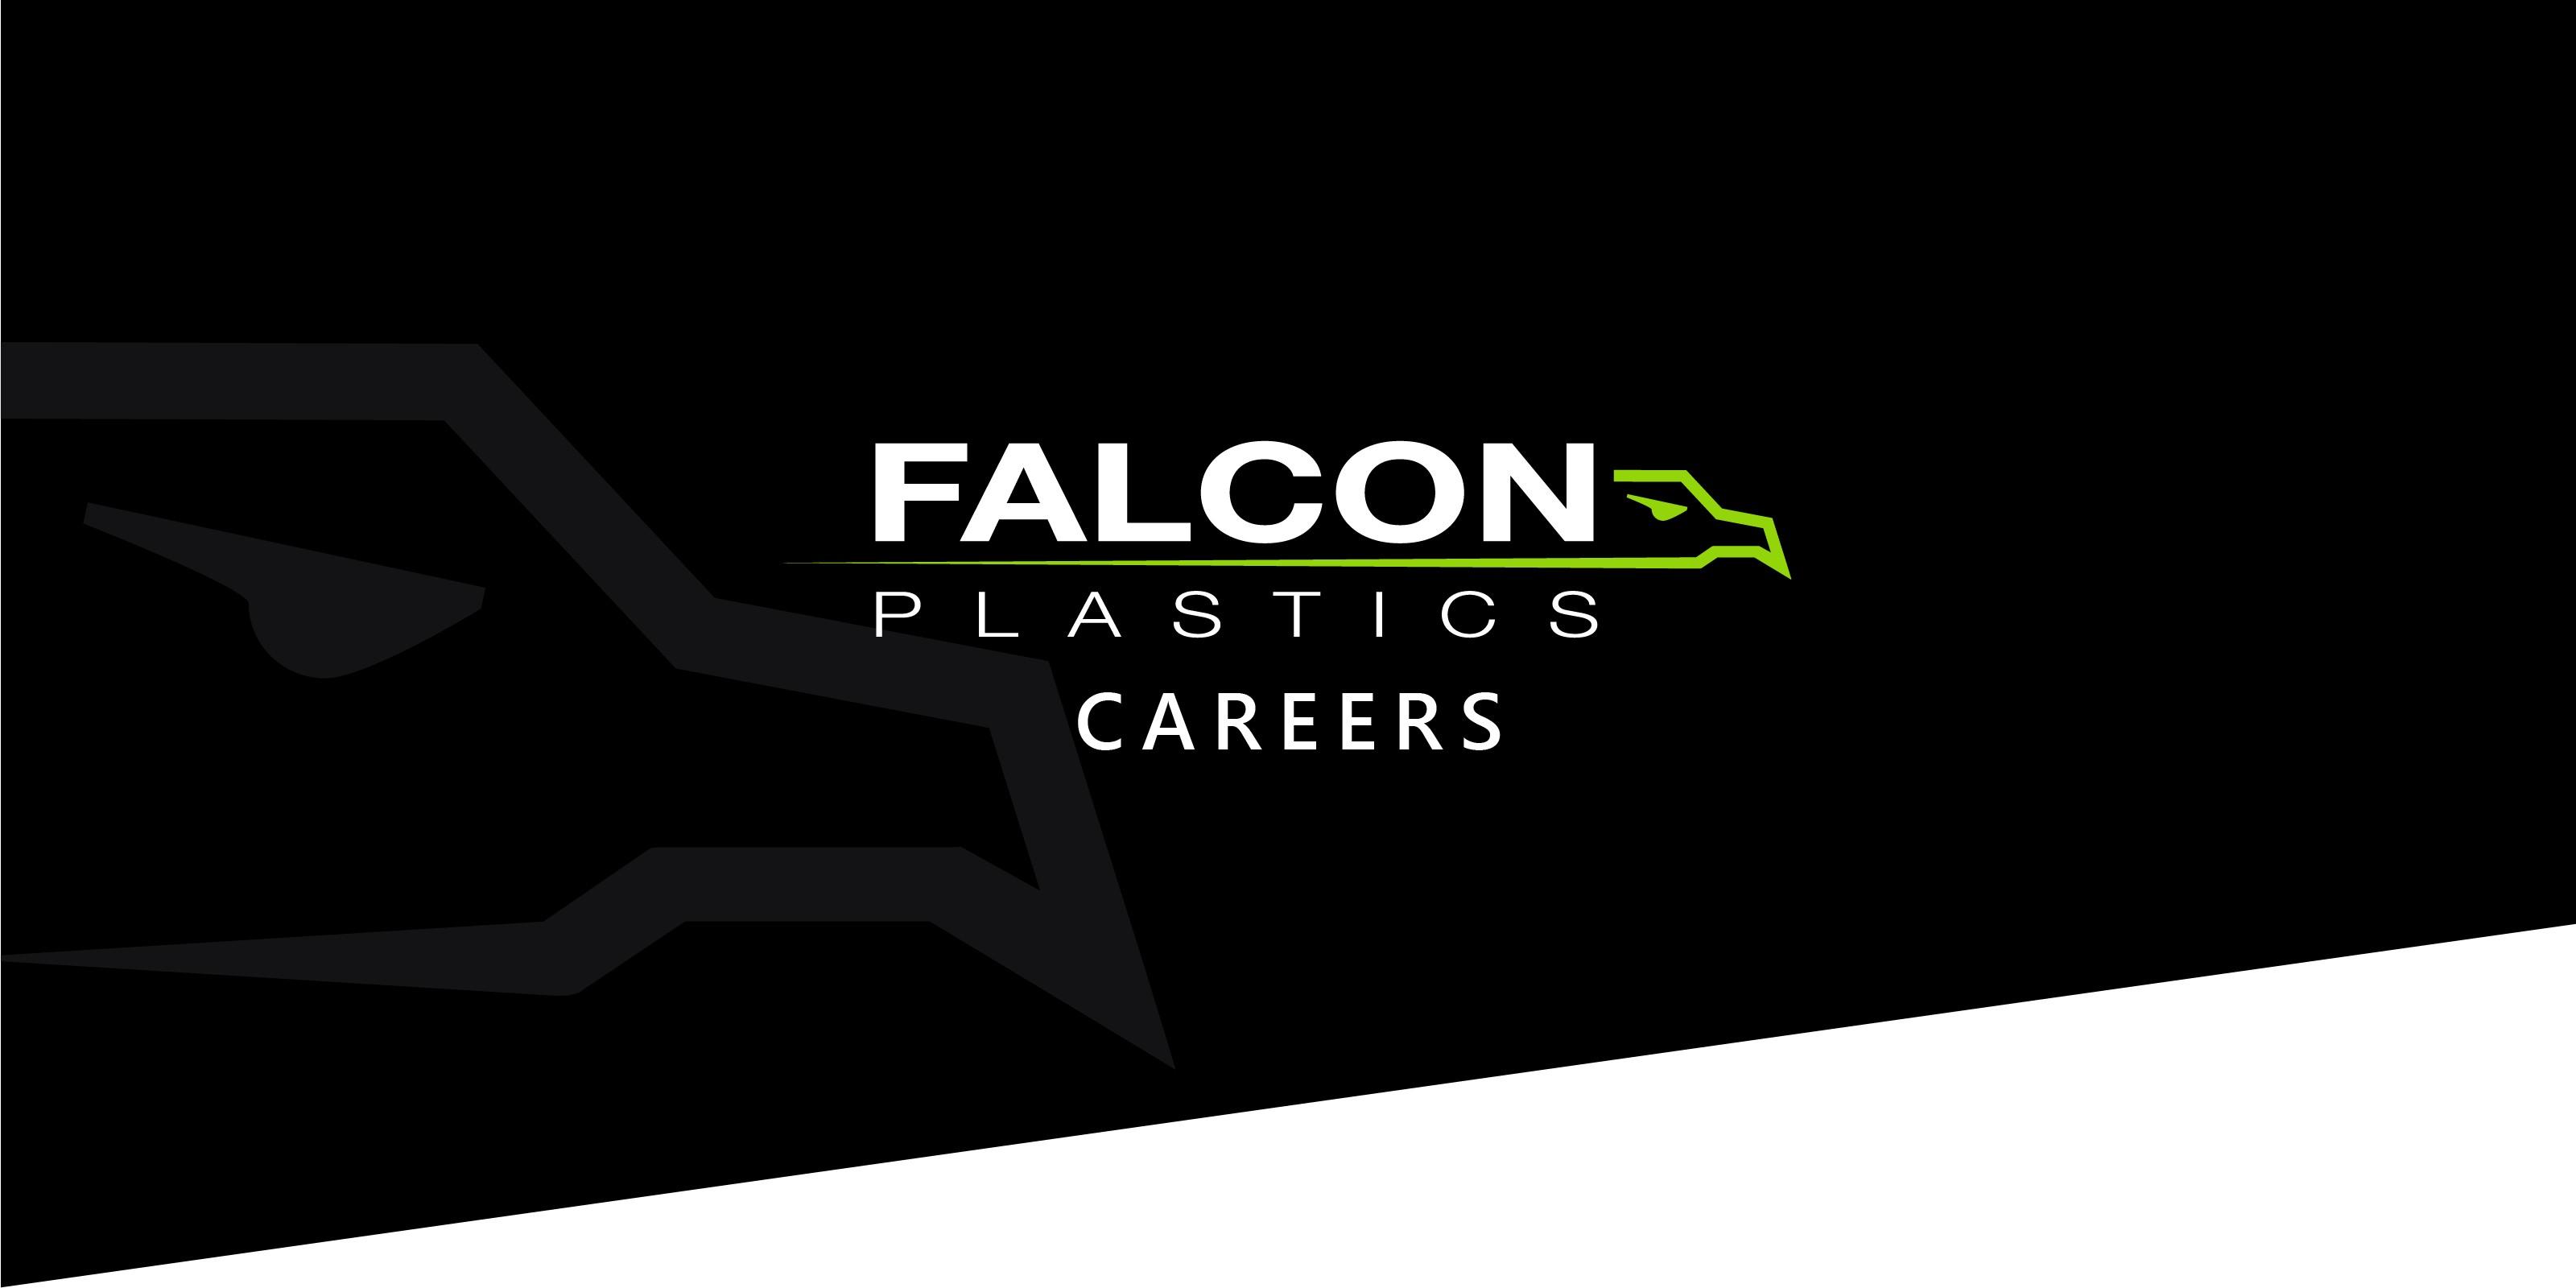 Falcon Plastics Careers | LinkedIn